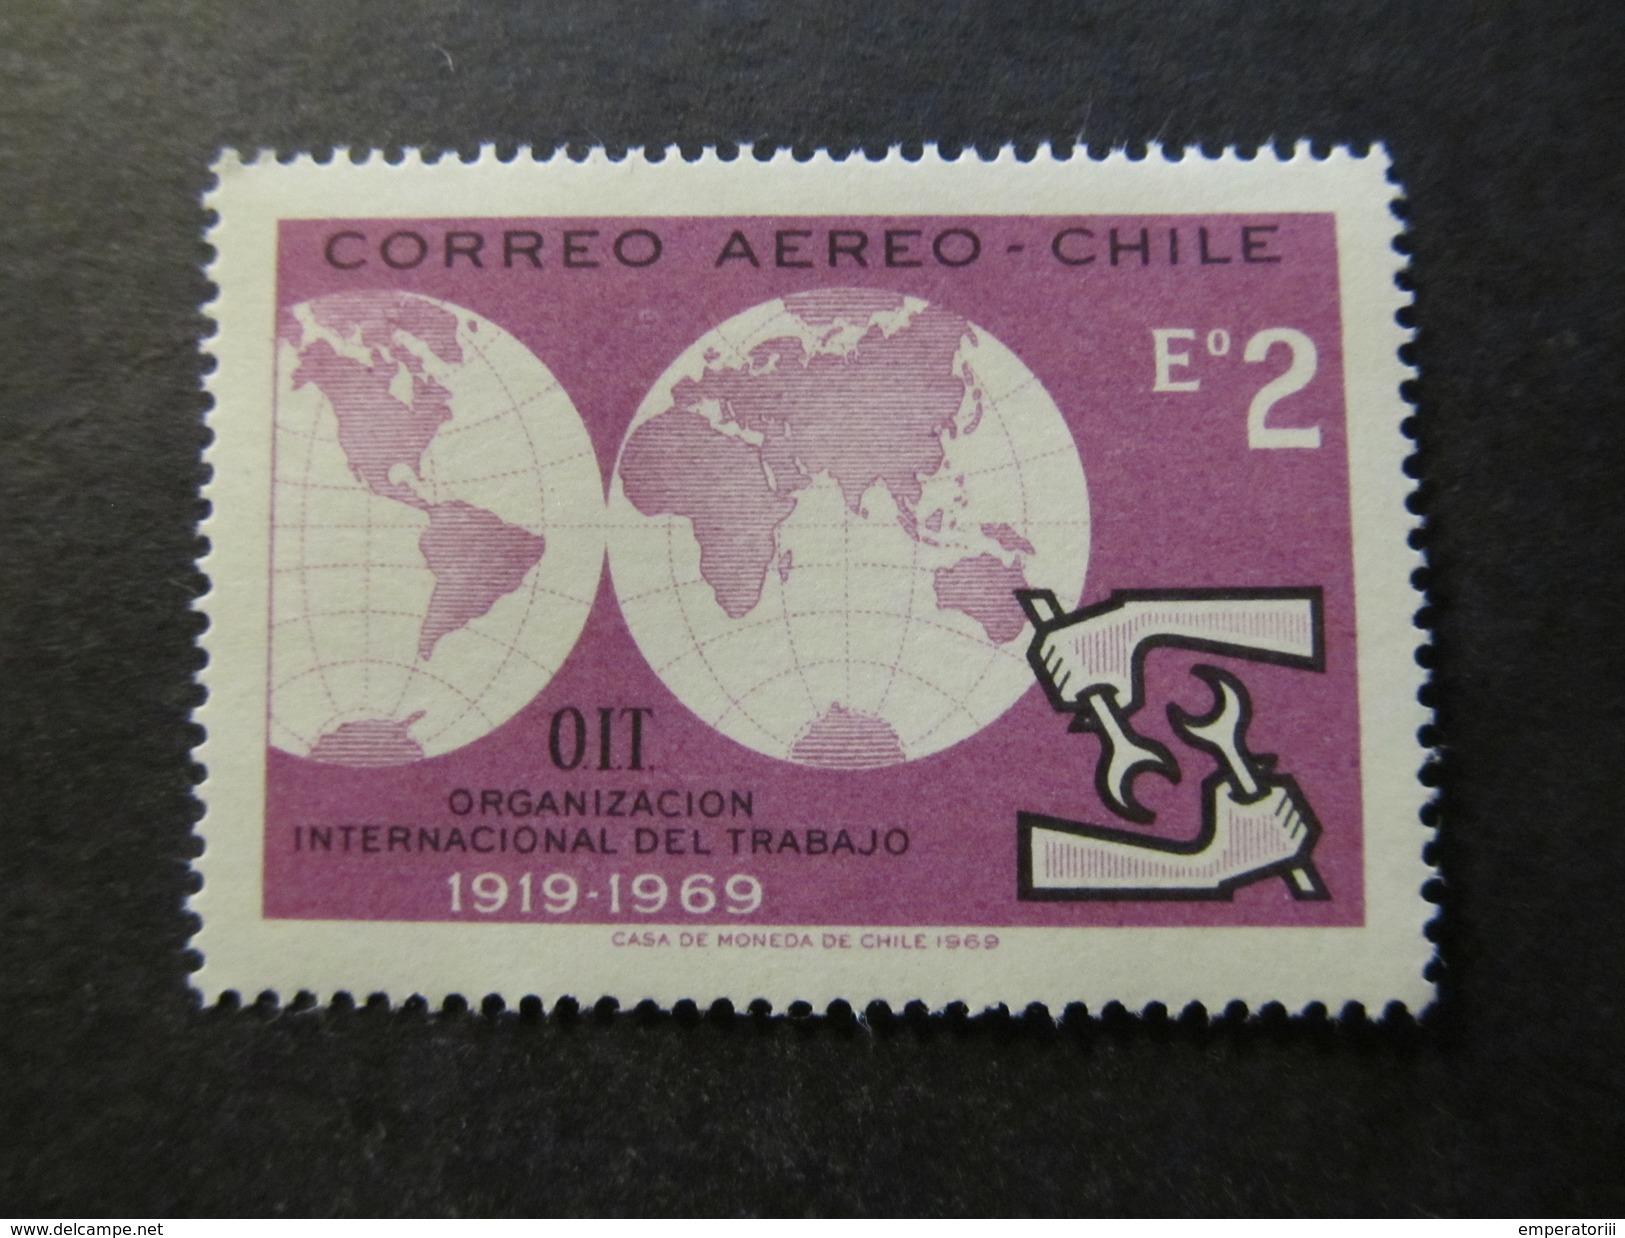 1969 - CHILE - ILO EMBLEM - SCOTT C296 A197 2E (1) - Chile